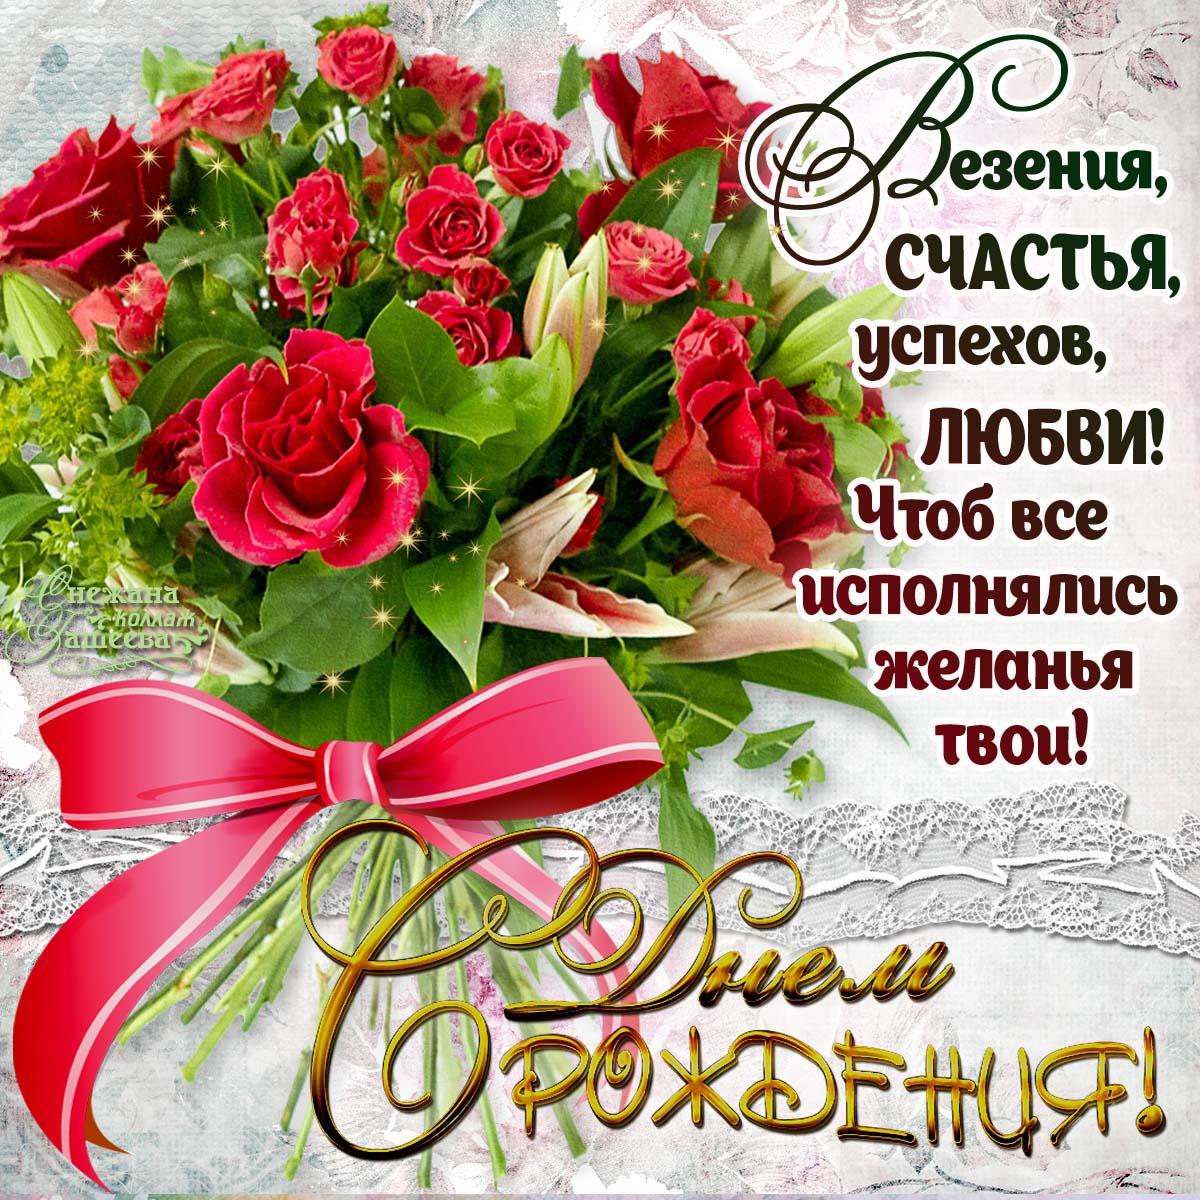 ВОСТОЧНО-ЕВРОПЕЙСКАЯ ОВЧАРКА АМАНАУЗ ЛАРИНА - Страница 9 2339600